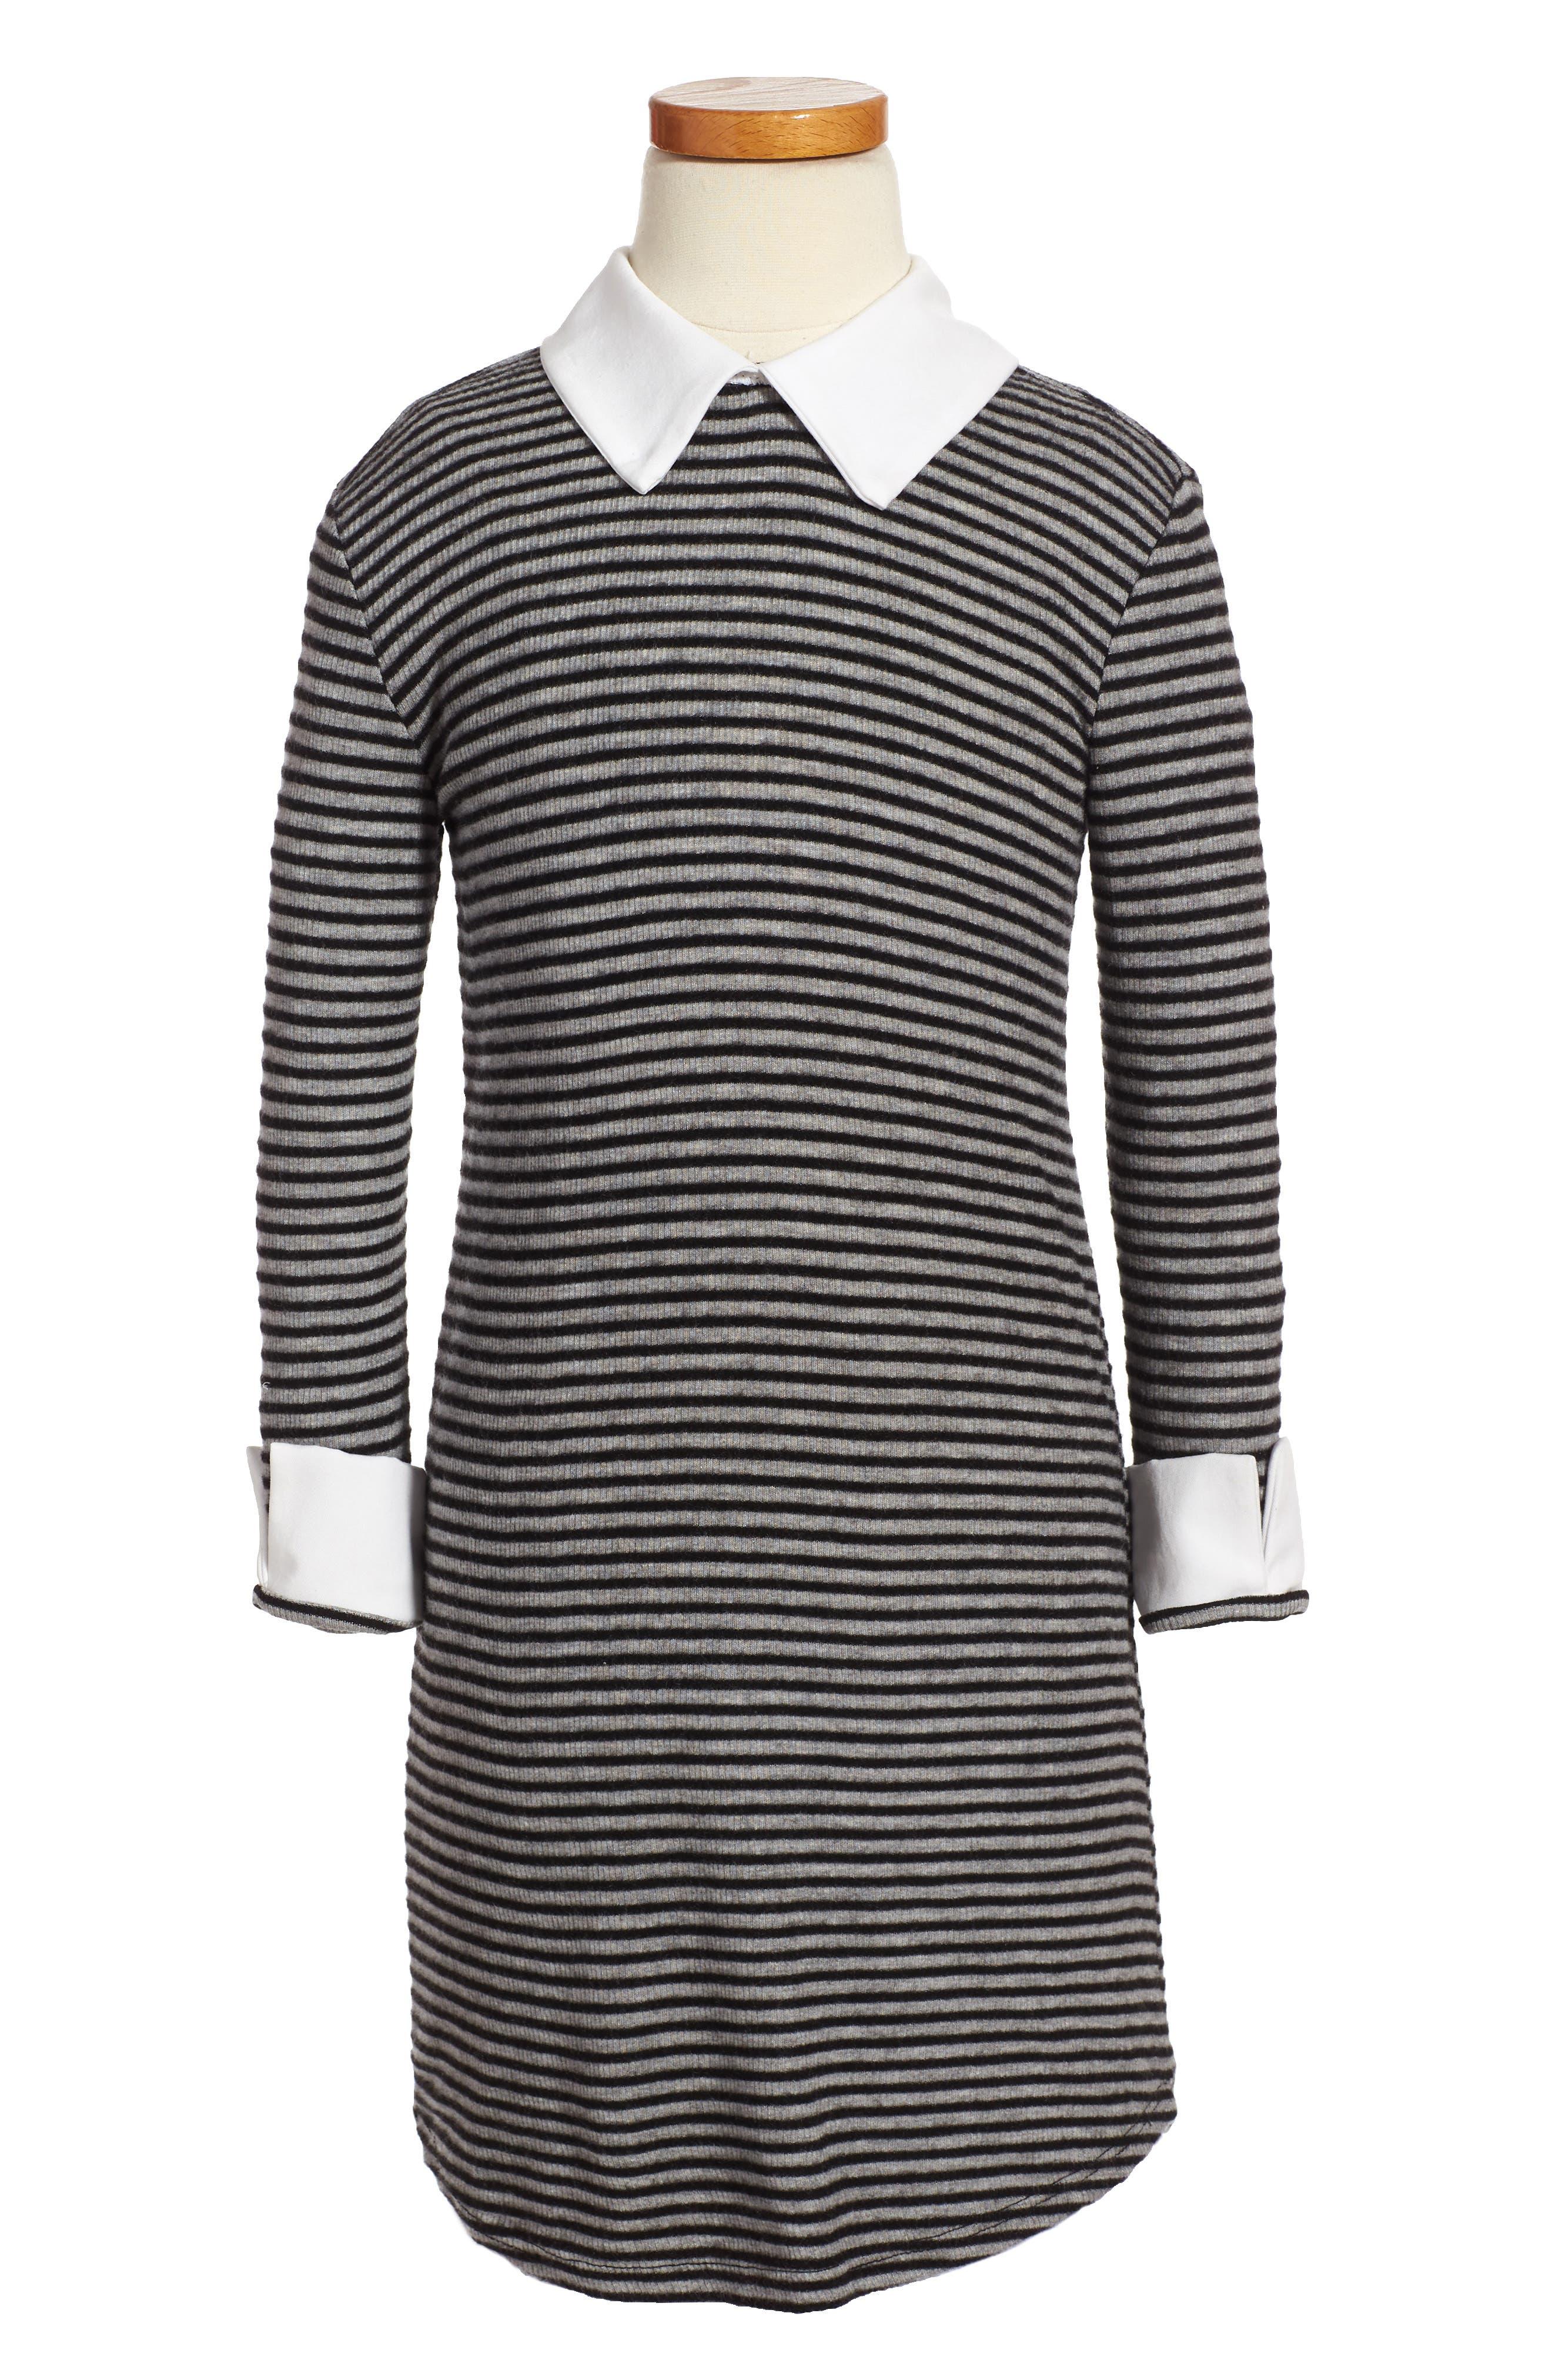 Alternate Image 1 Selected - Kiddo Mixed Media Stripe Dress (Big Girls)